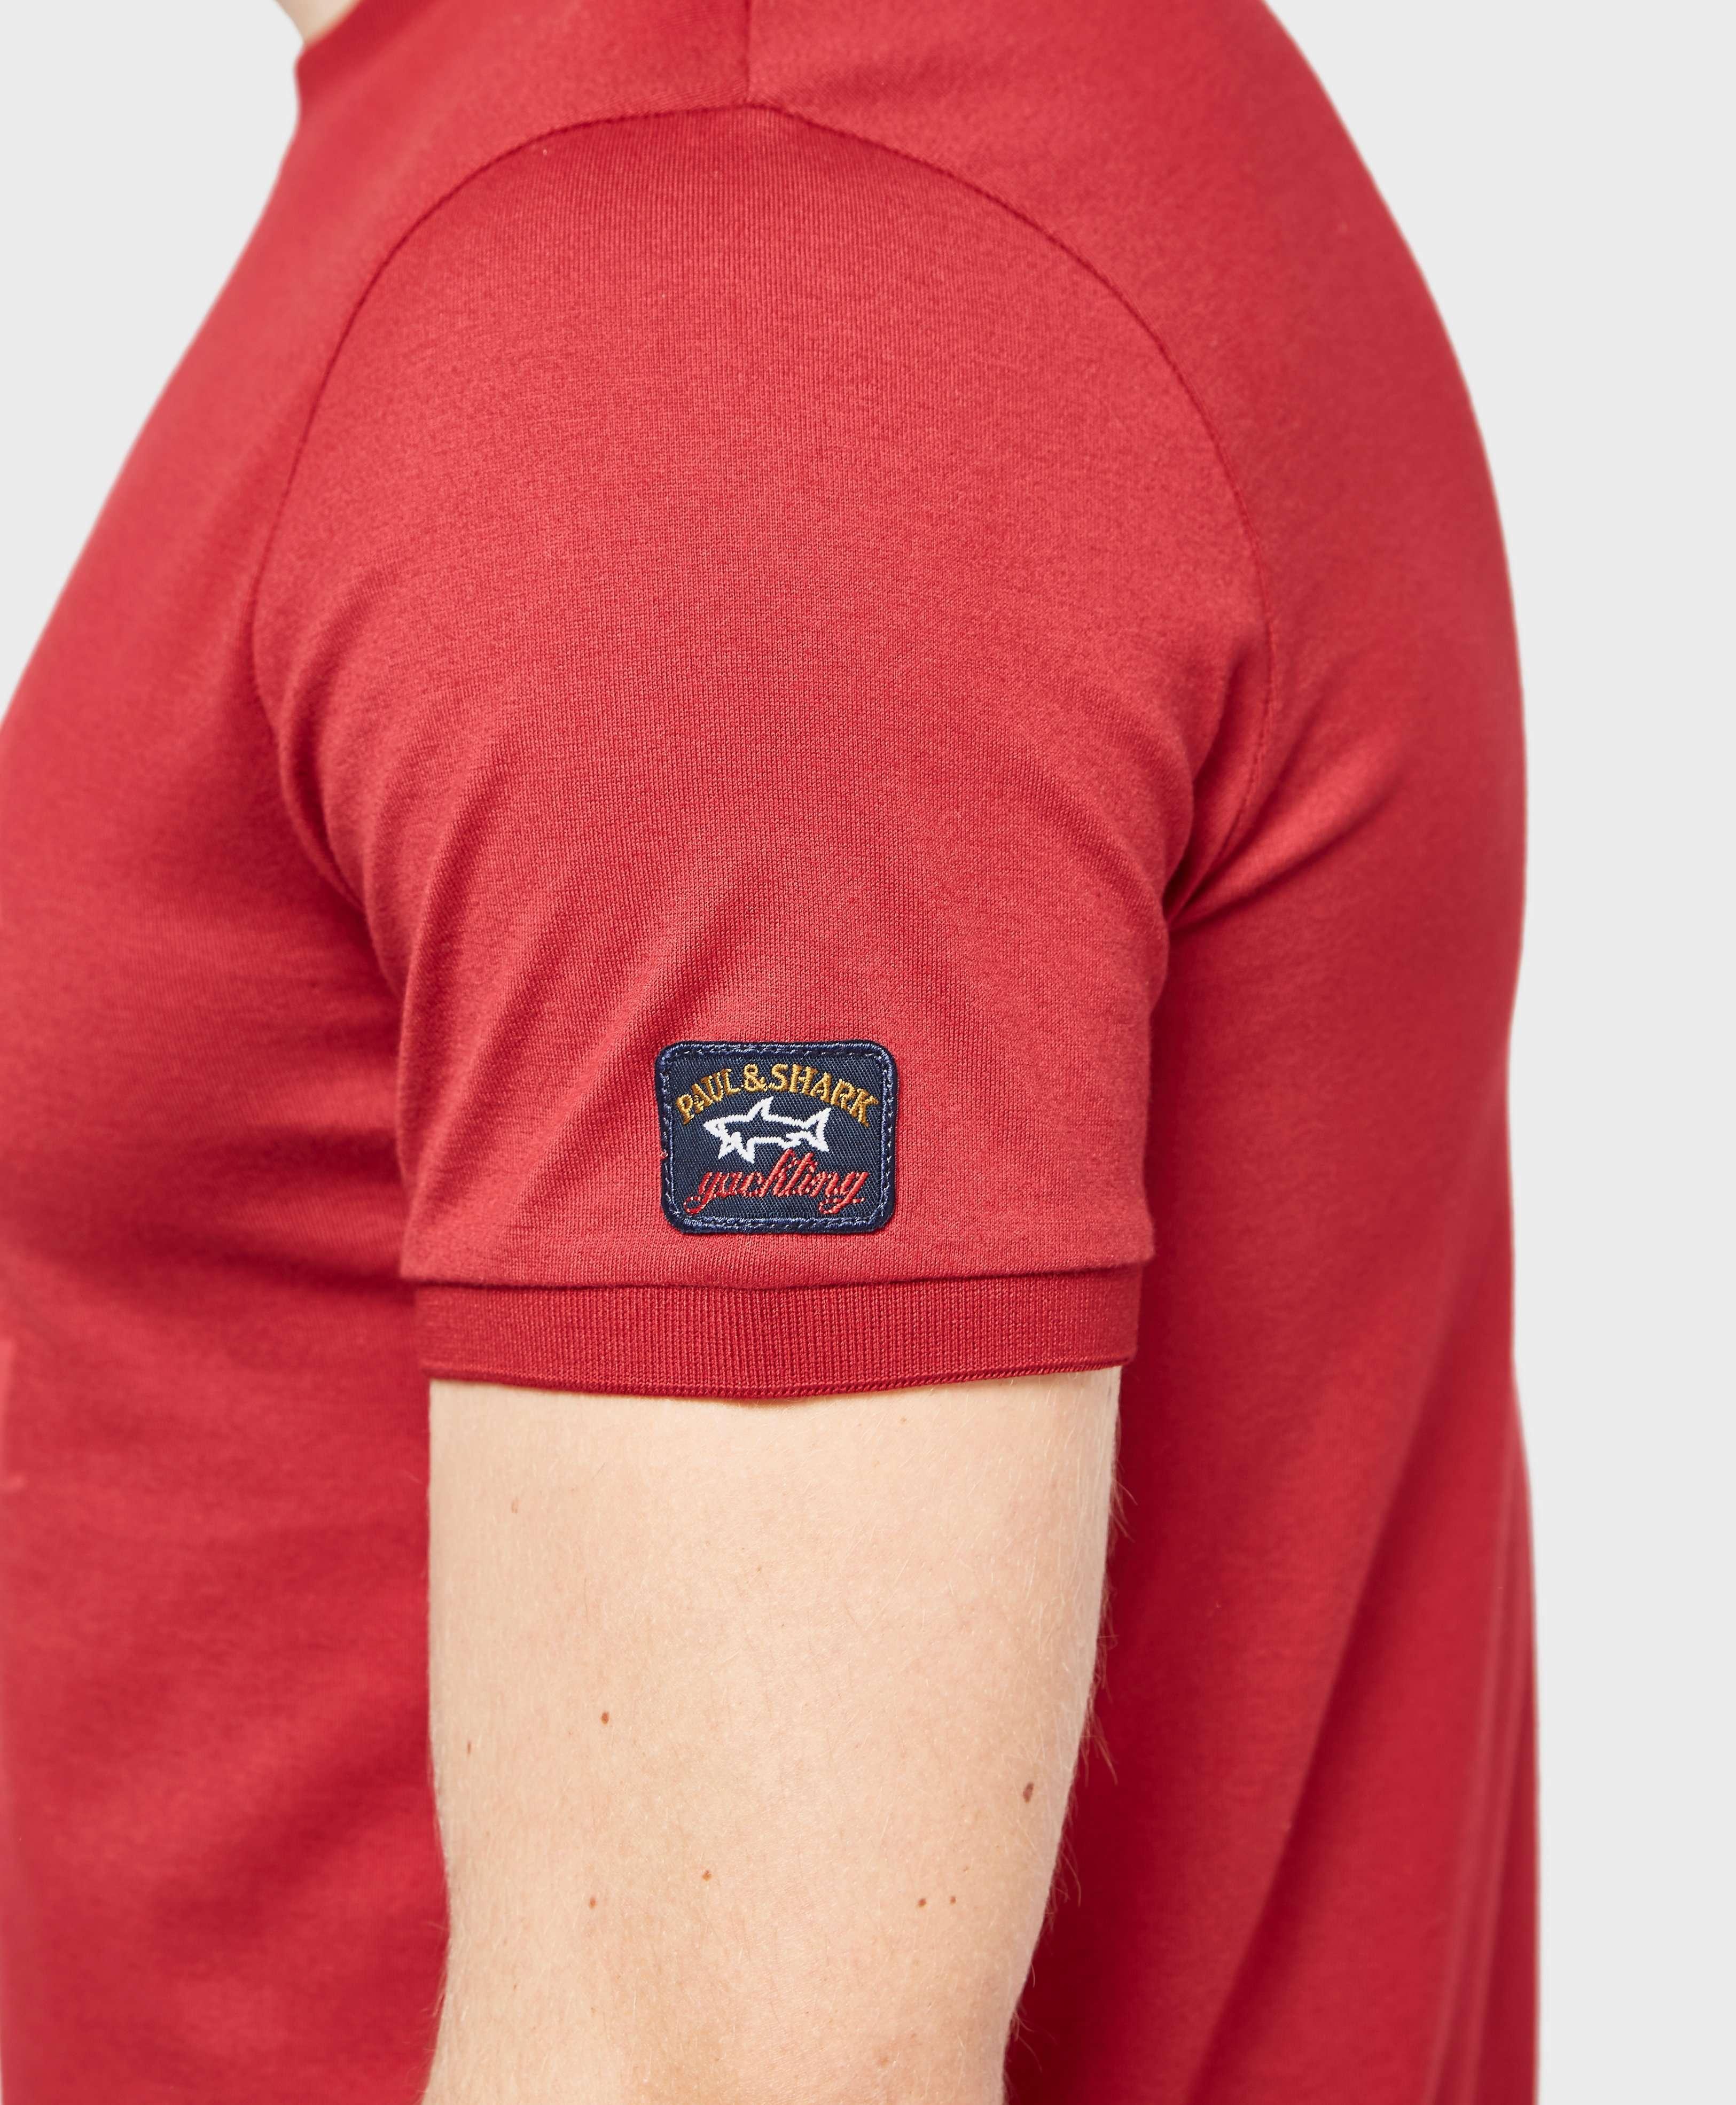 Paul and Shark Tonal Logo Short Sleeve T-Shirt - Exclusive